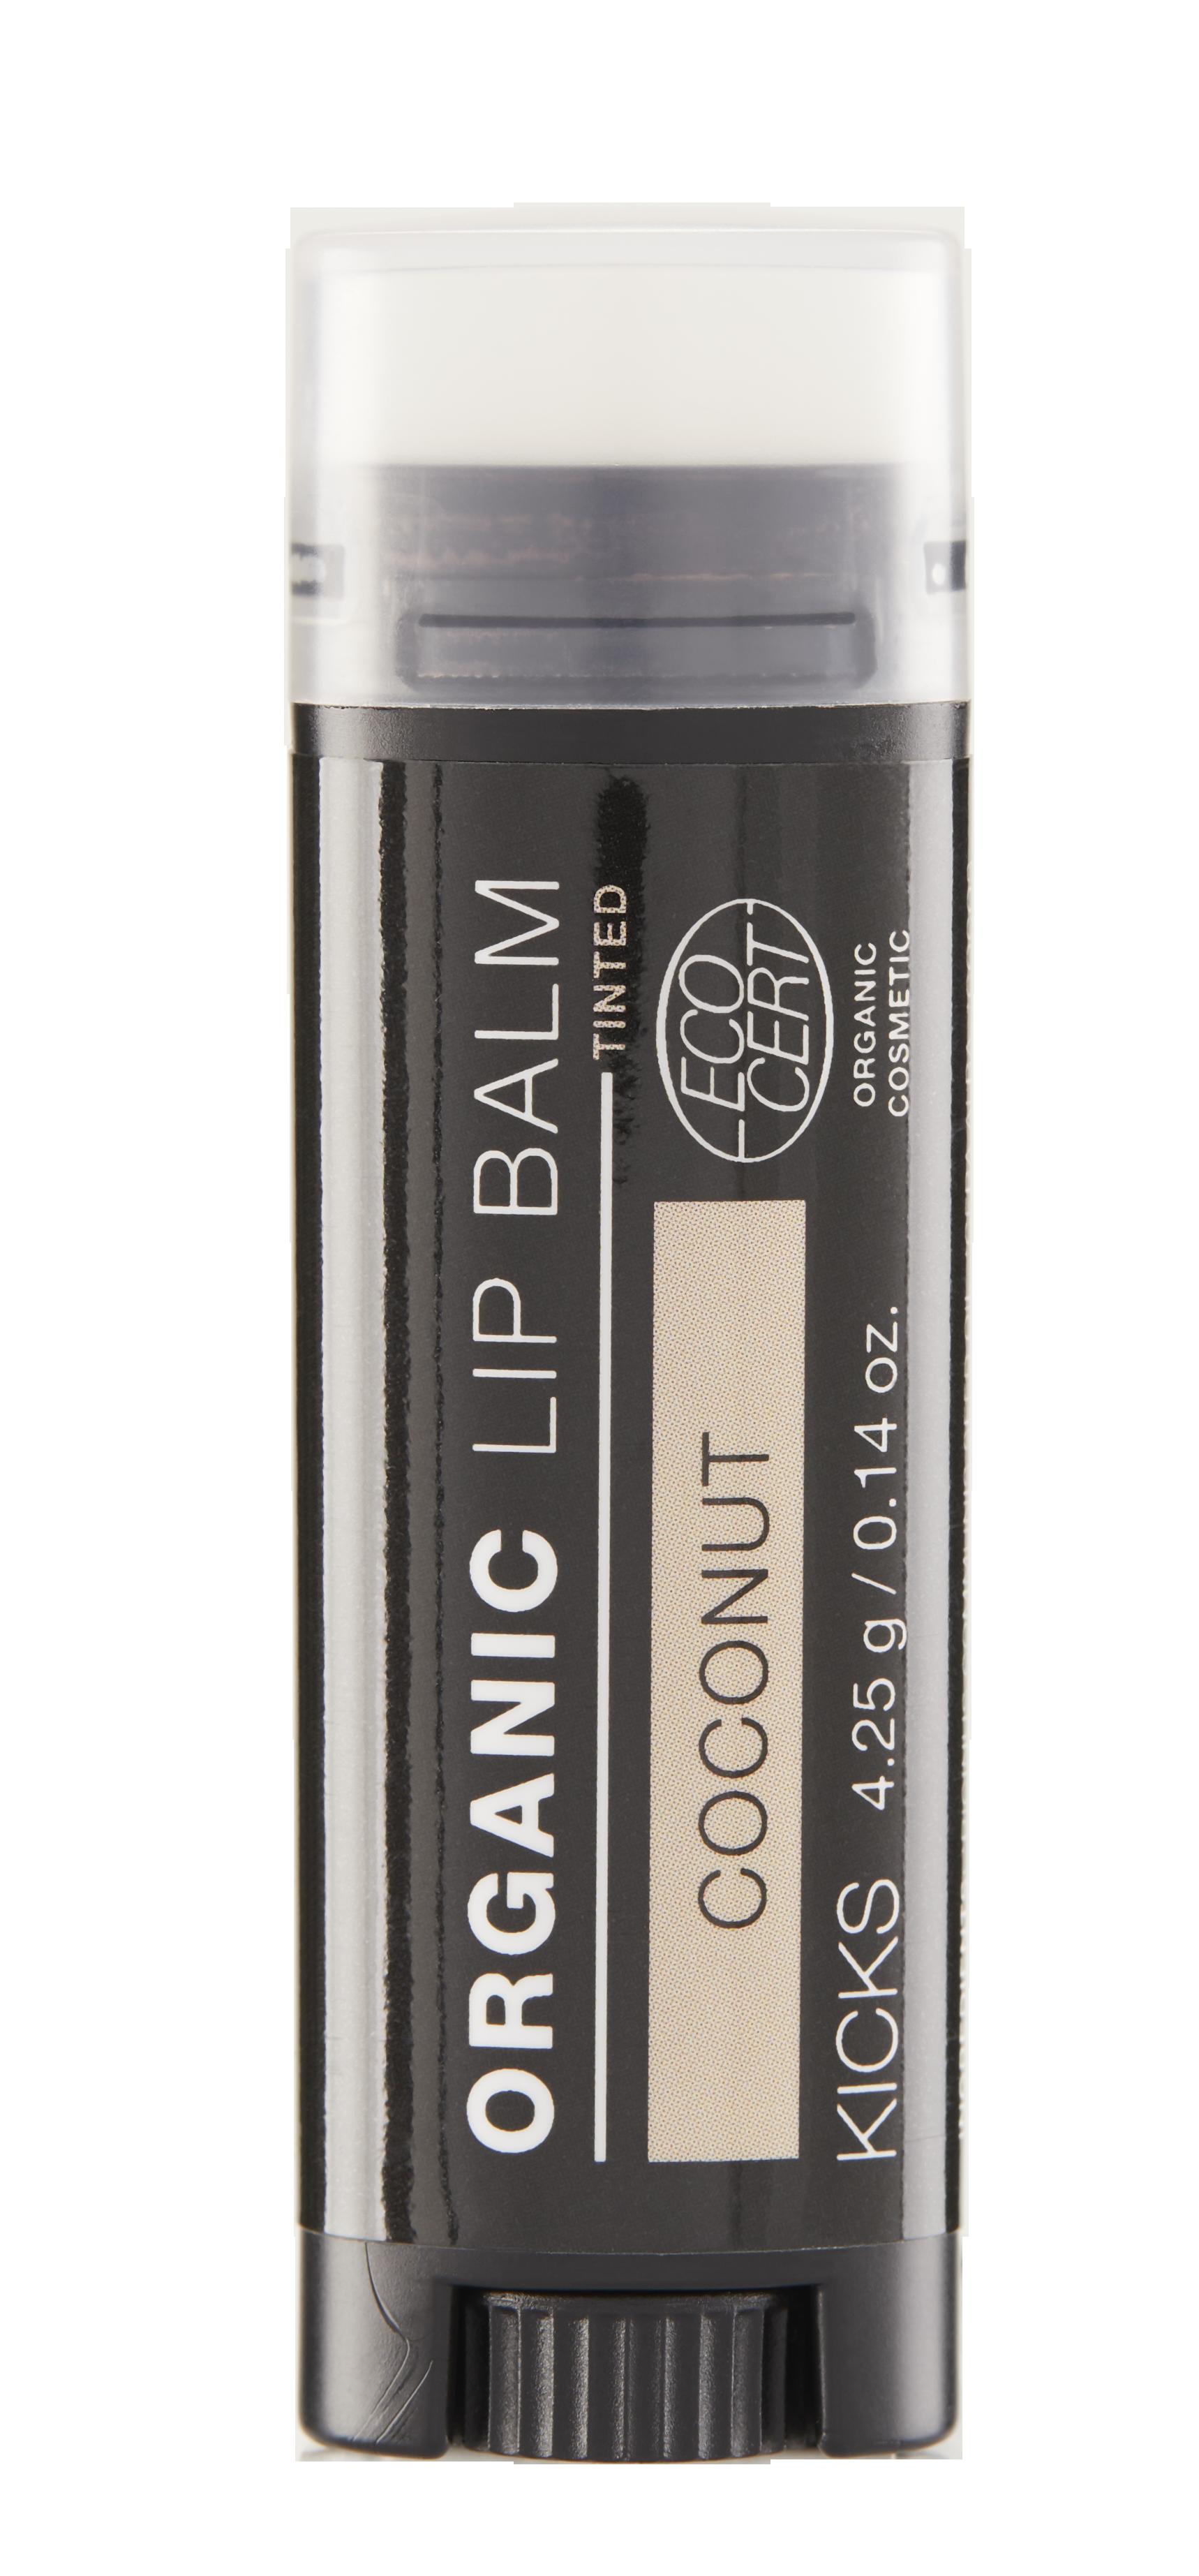 Certified Organic Lip Balm